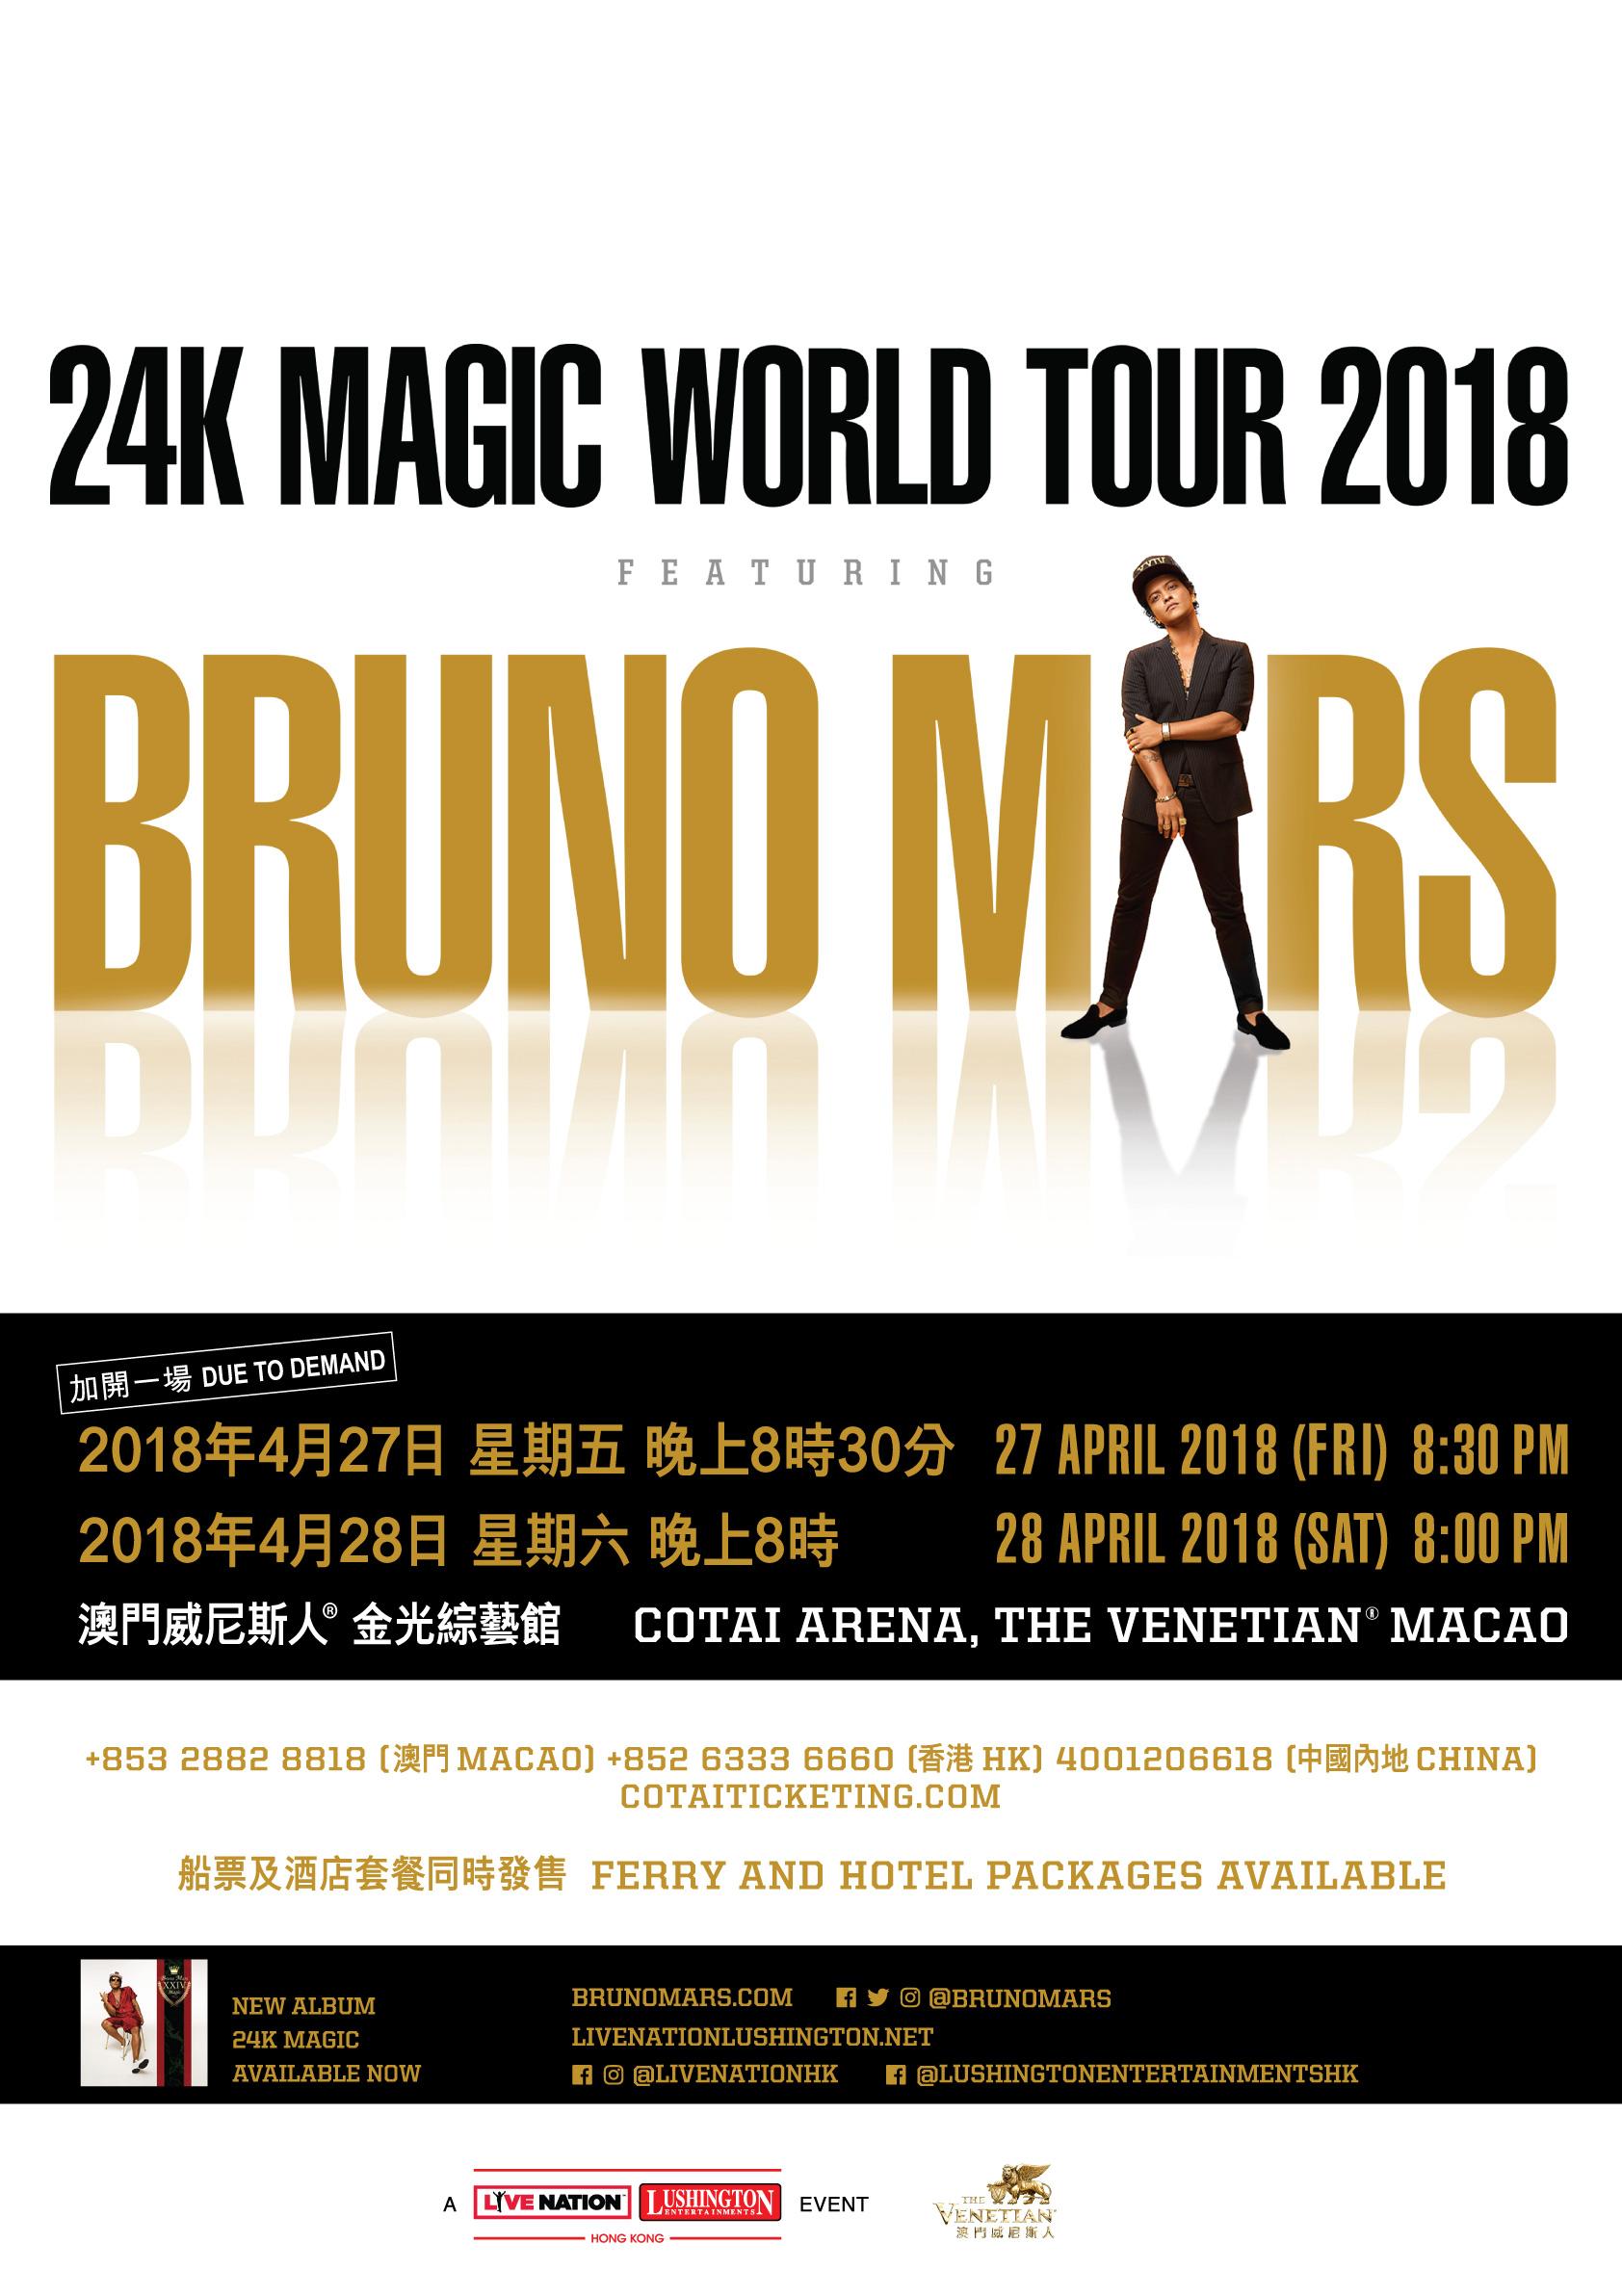 《24K MAGIC WORLD TOUR 2018》澳门站 - 澳门威尼斯人